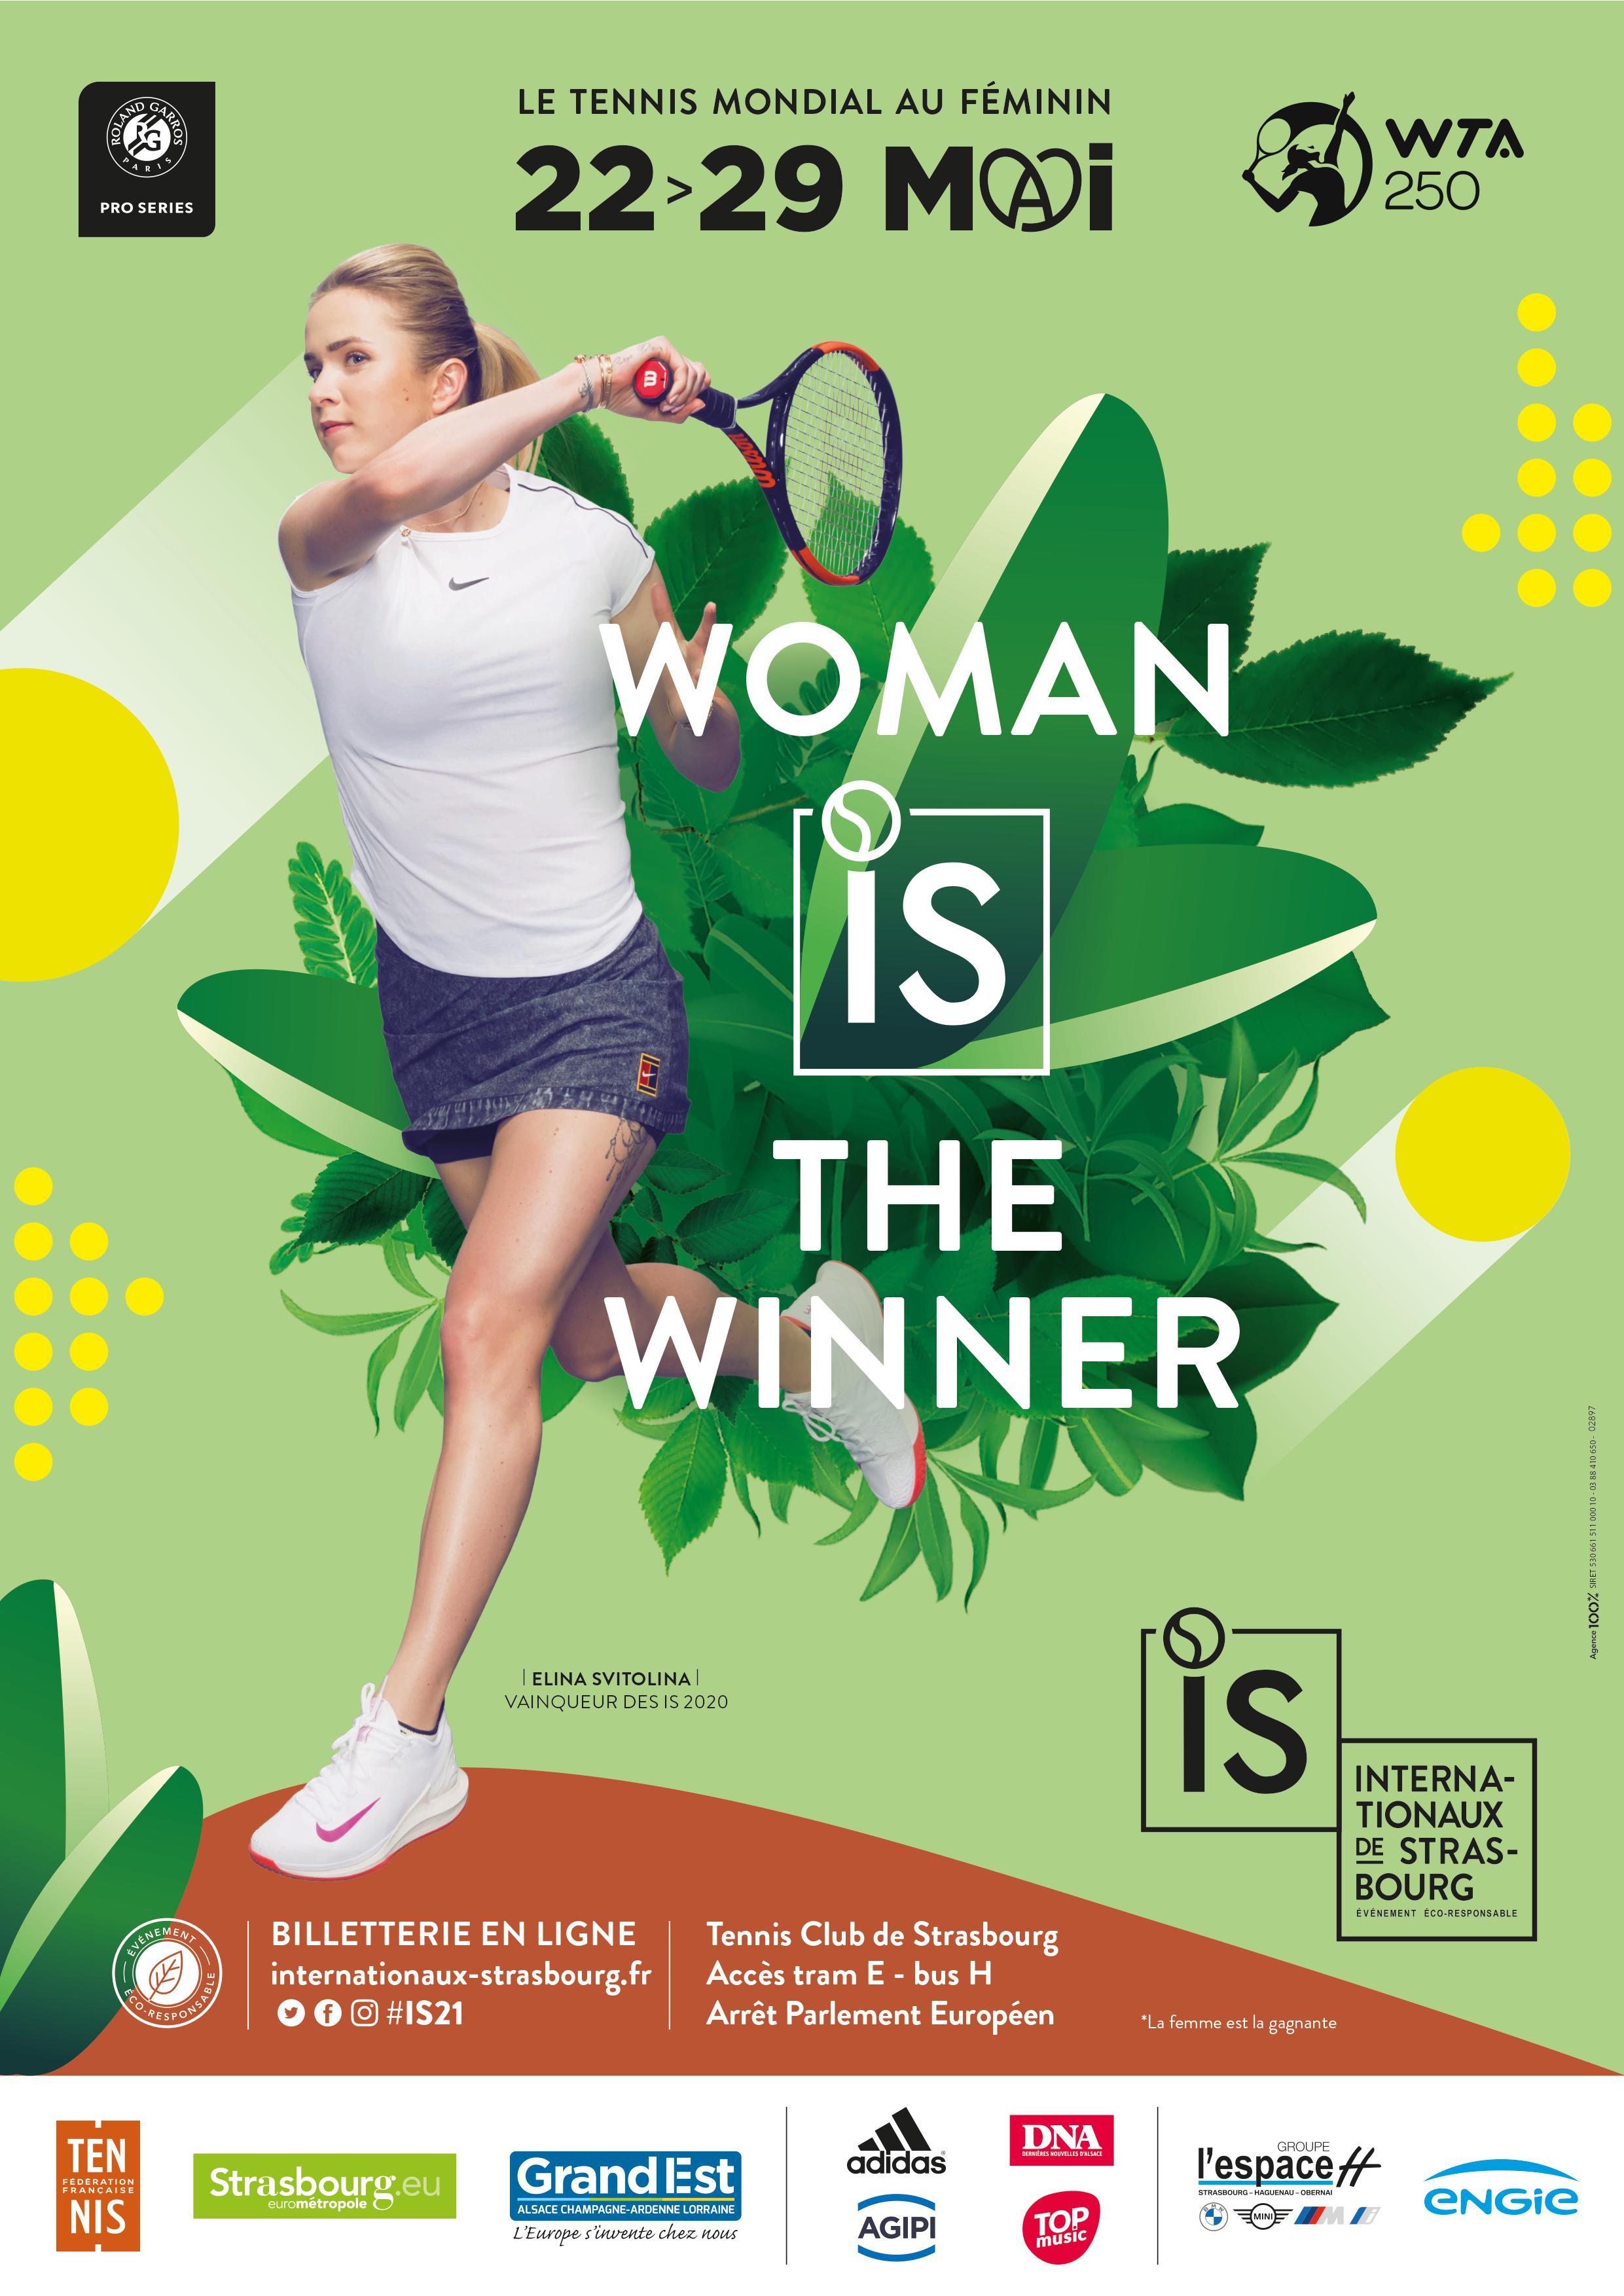 Internationaux de tennis 2019